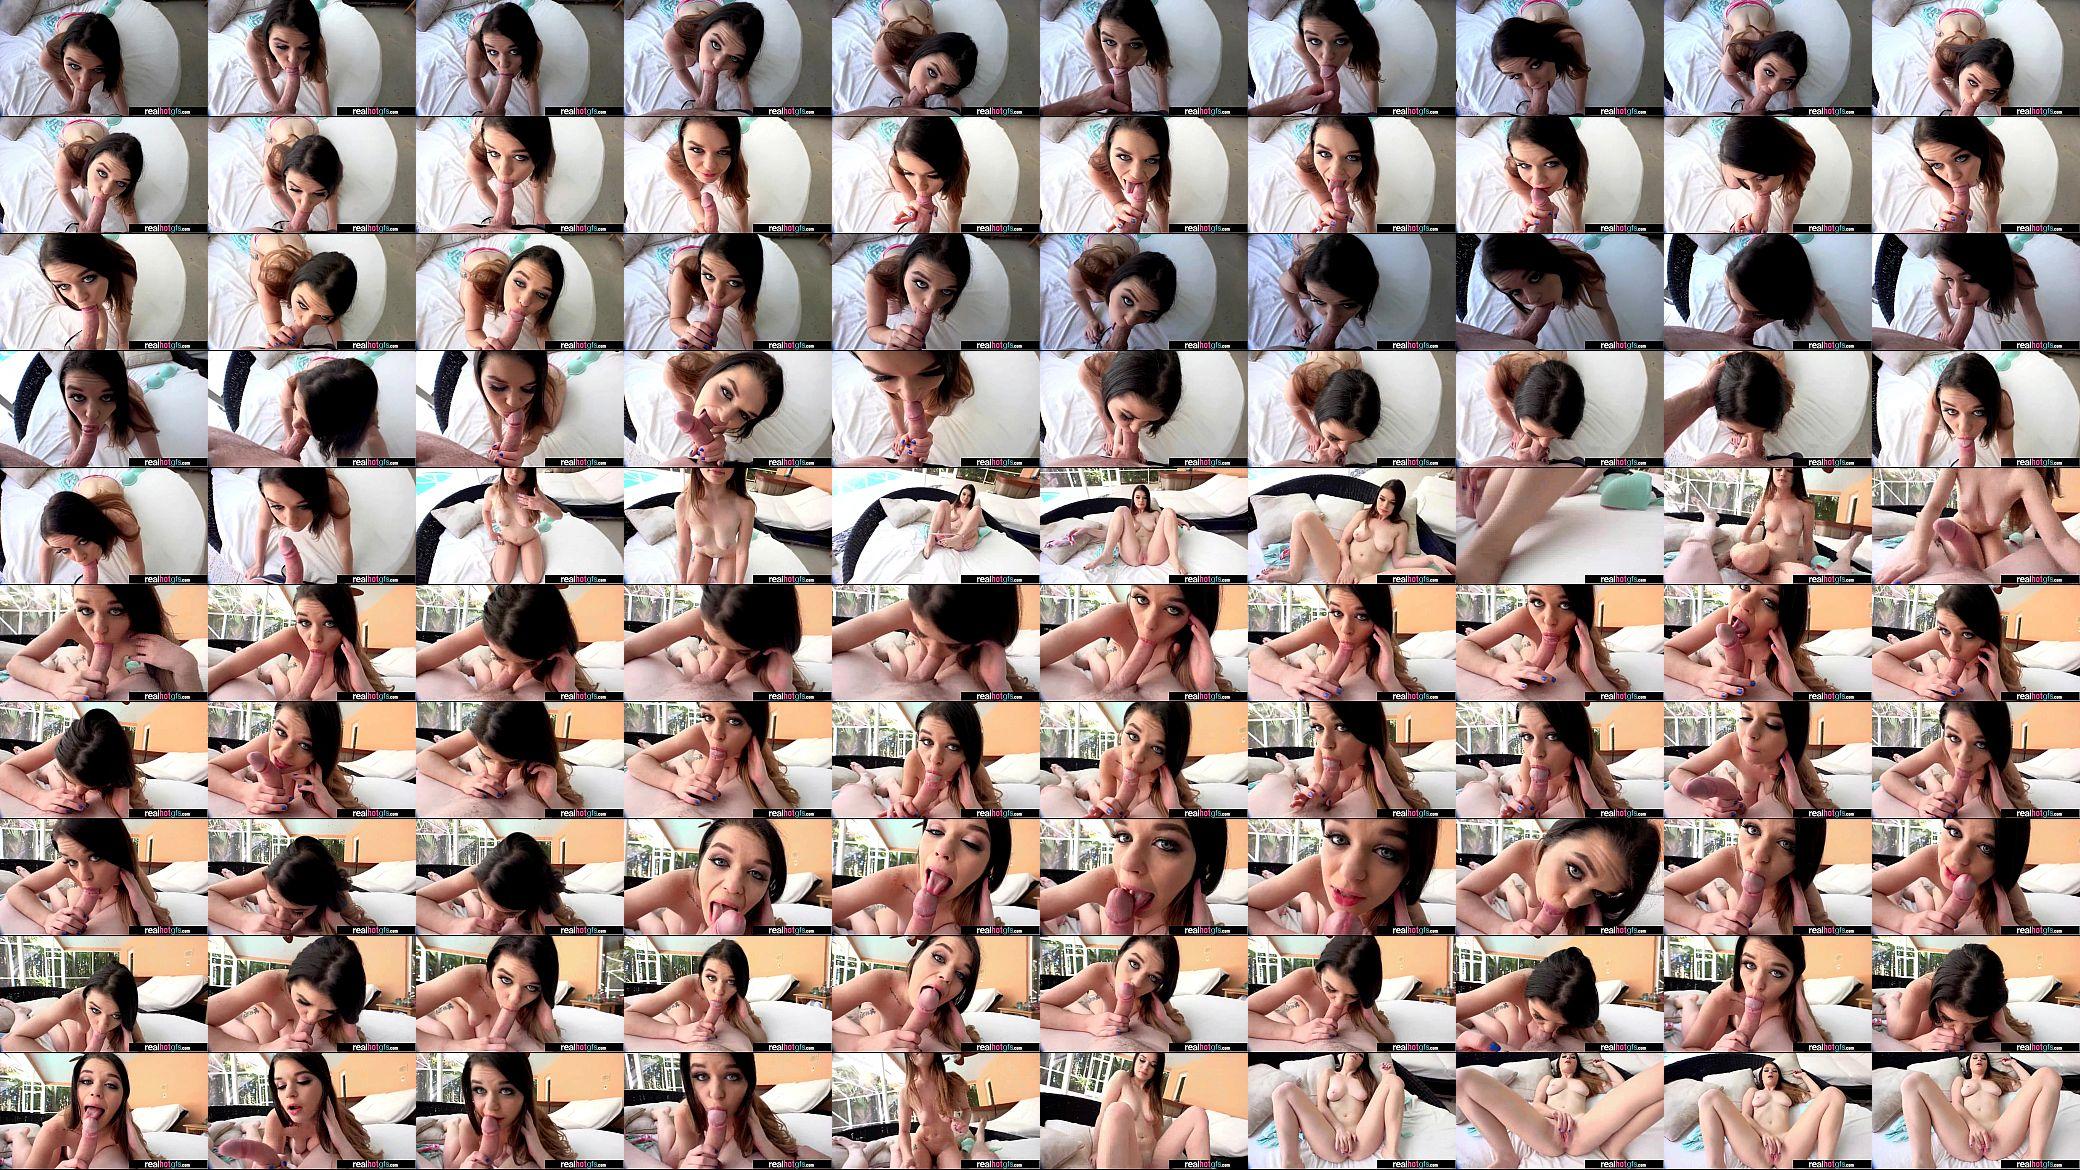 Africa Klein Porn Anastasia Mayo amazing sex on camera with naughty real gf (anastasia rose